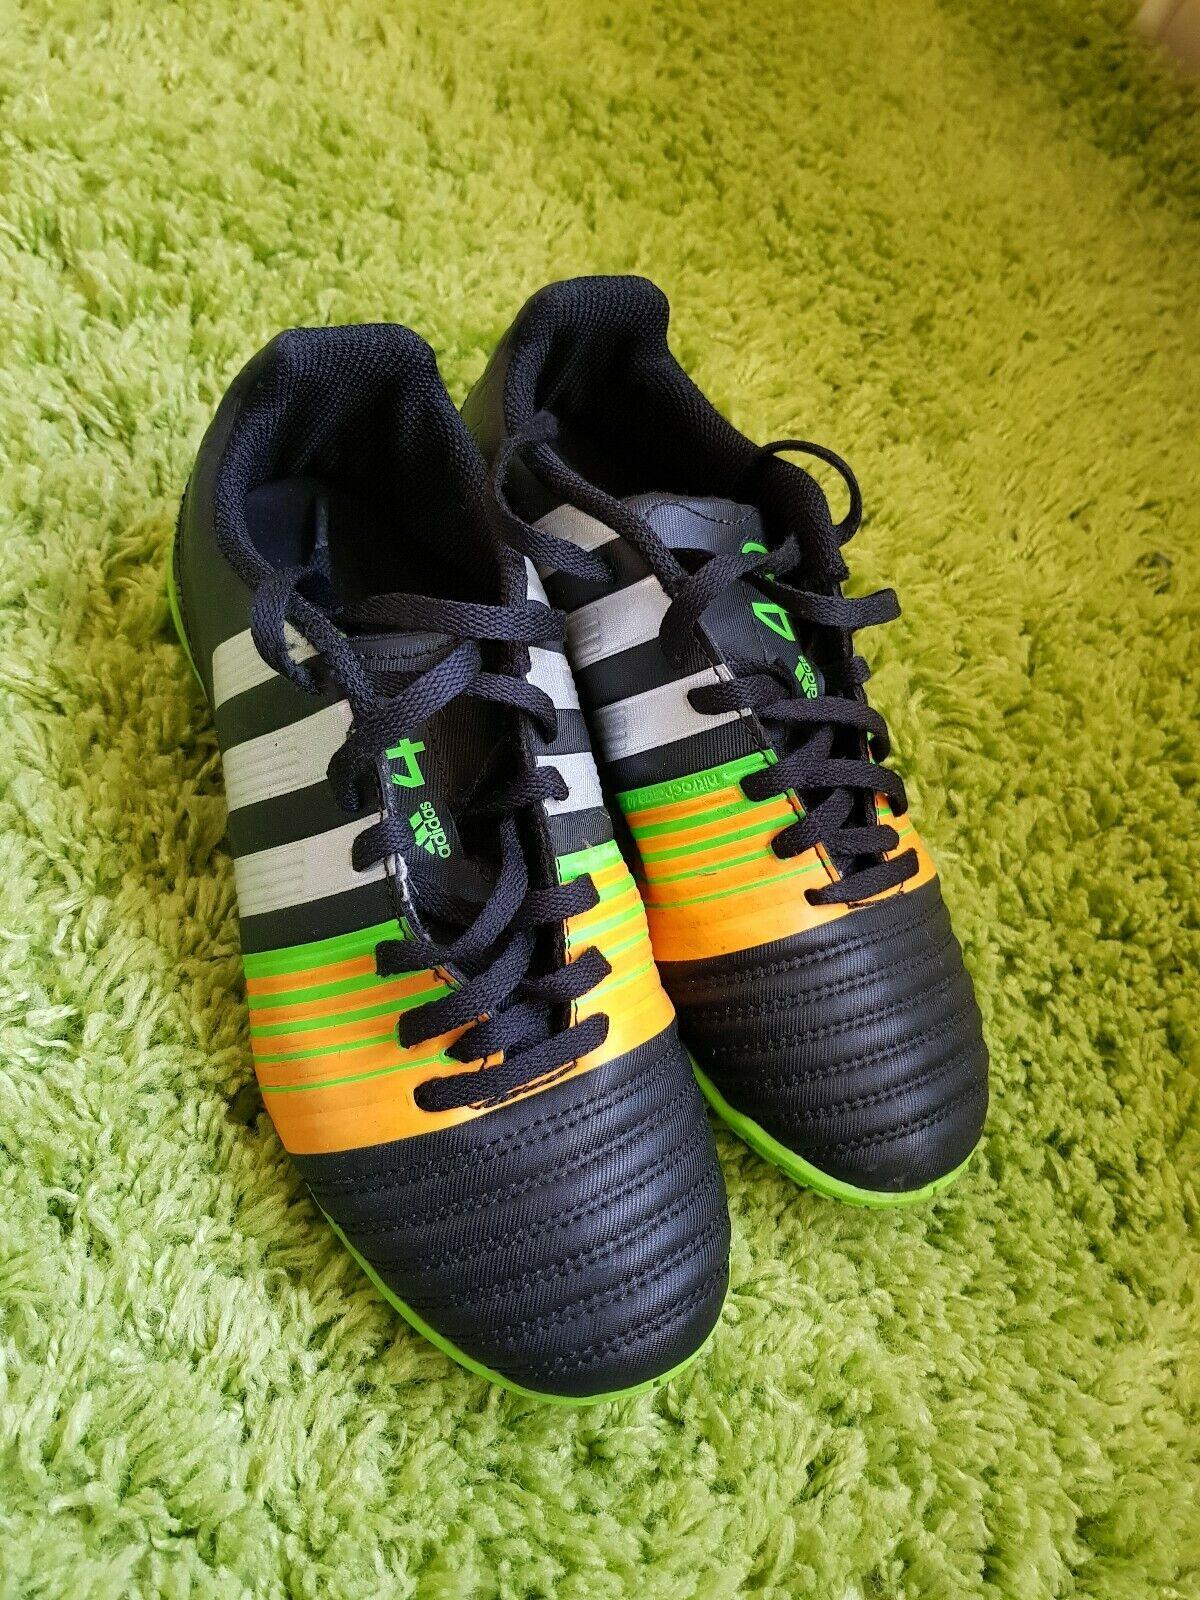 Astredurf football boots size 4